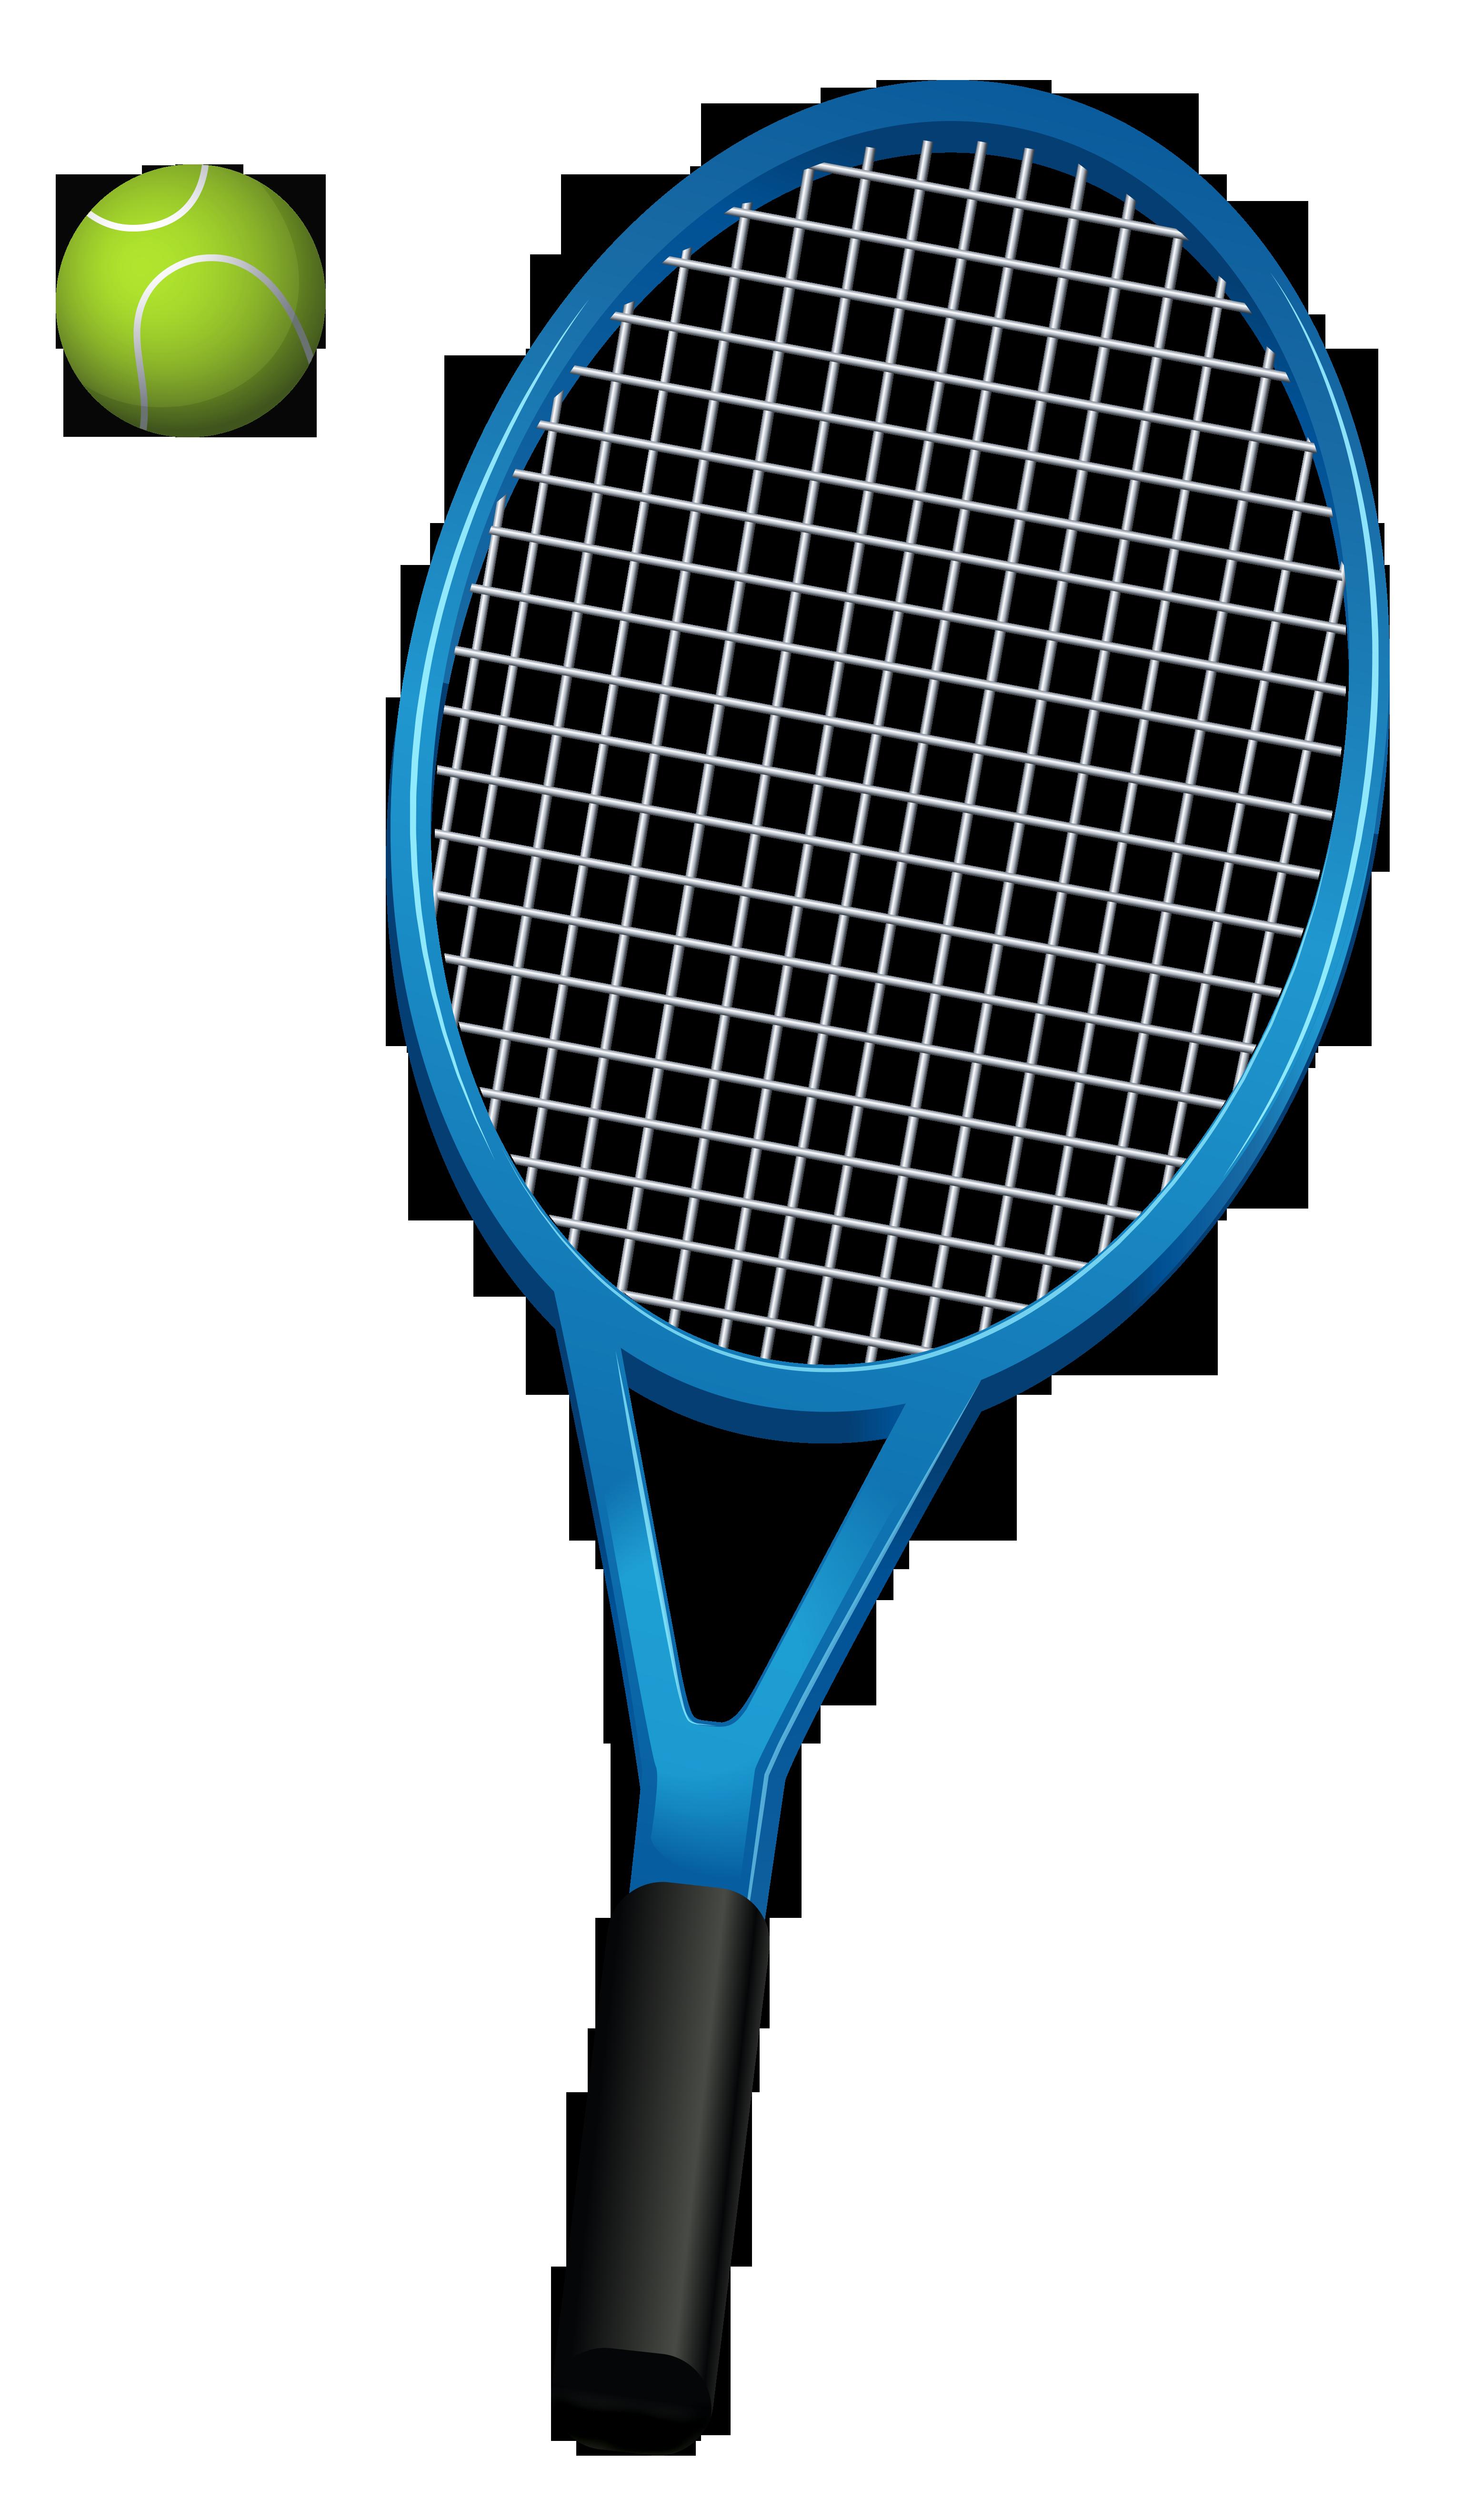 3116x5290 Tennis Racket Clipart Many Interesting Cliparts